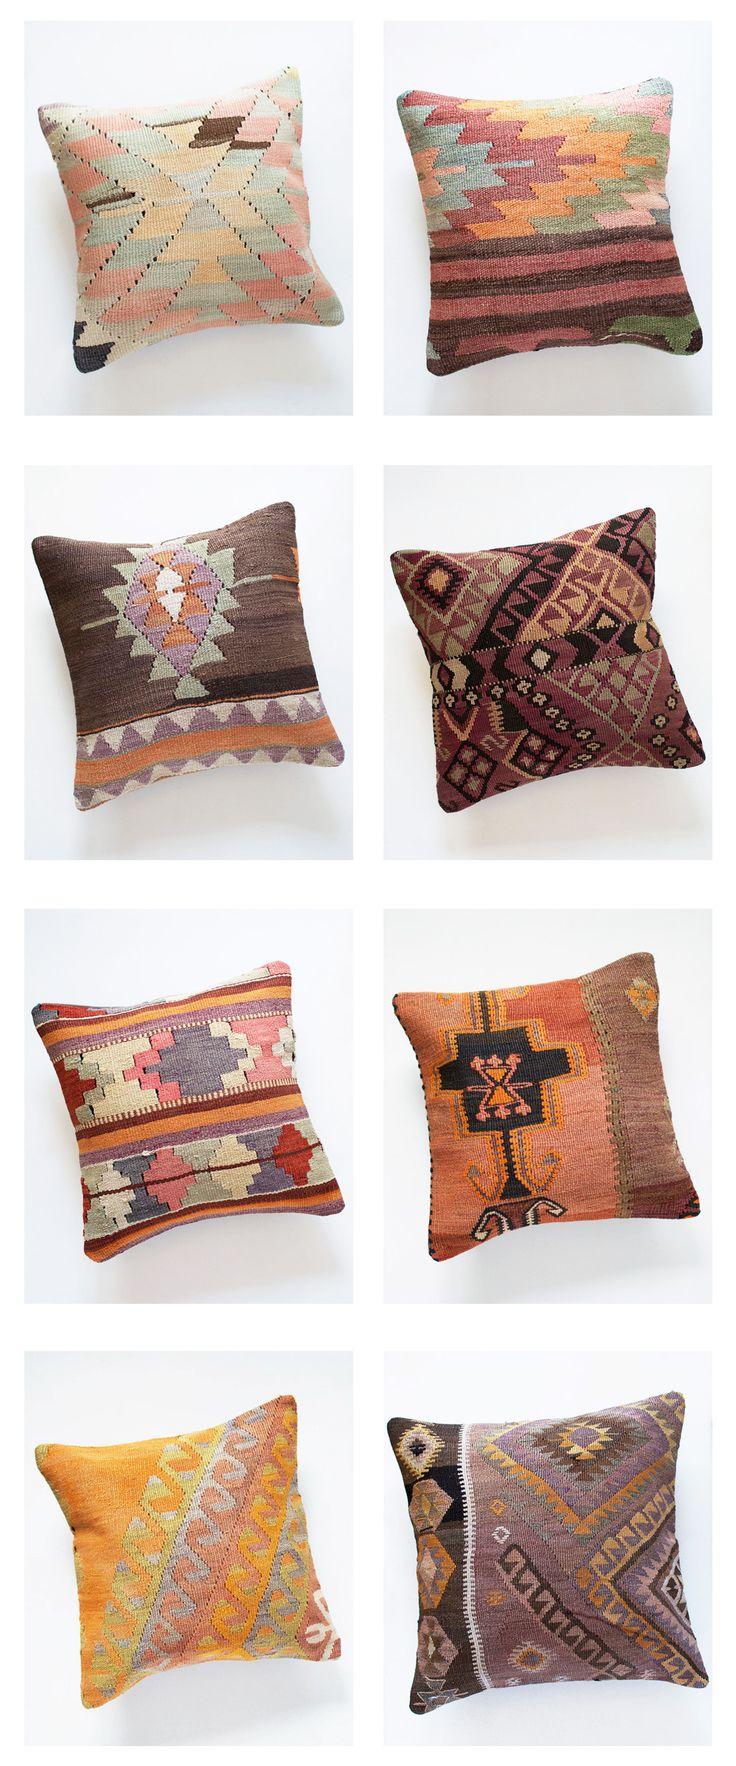 Best 25+ Kilim pillows ideas on Pinterest | Colorful ...